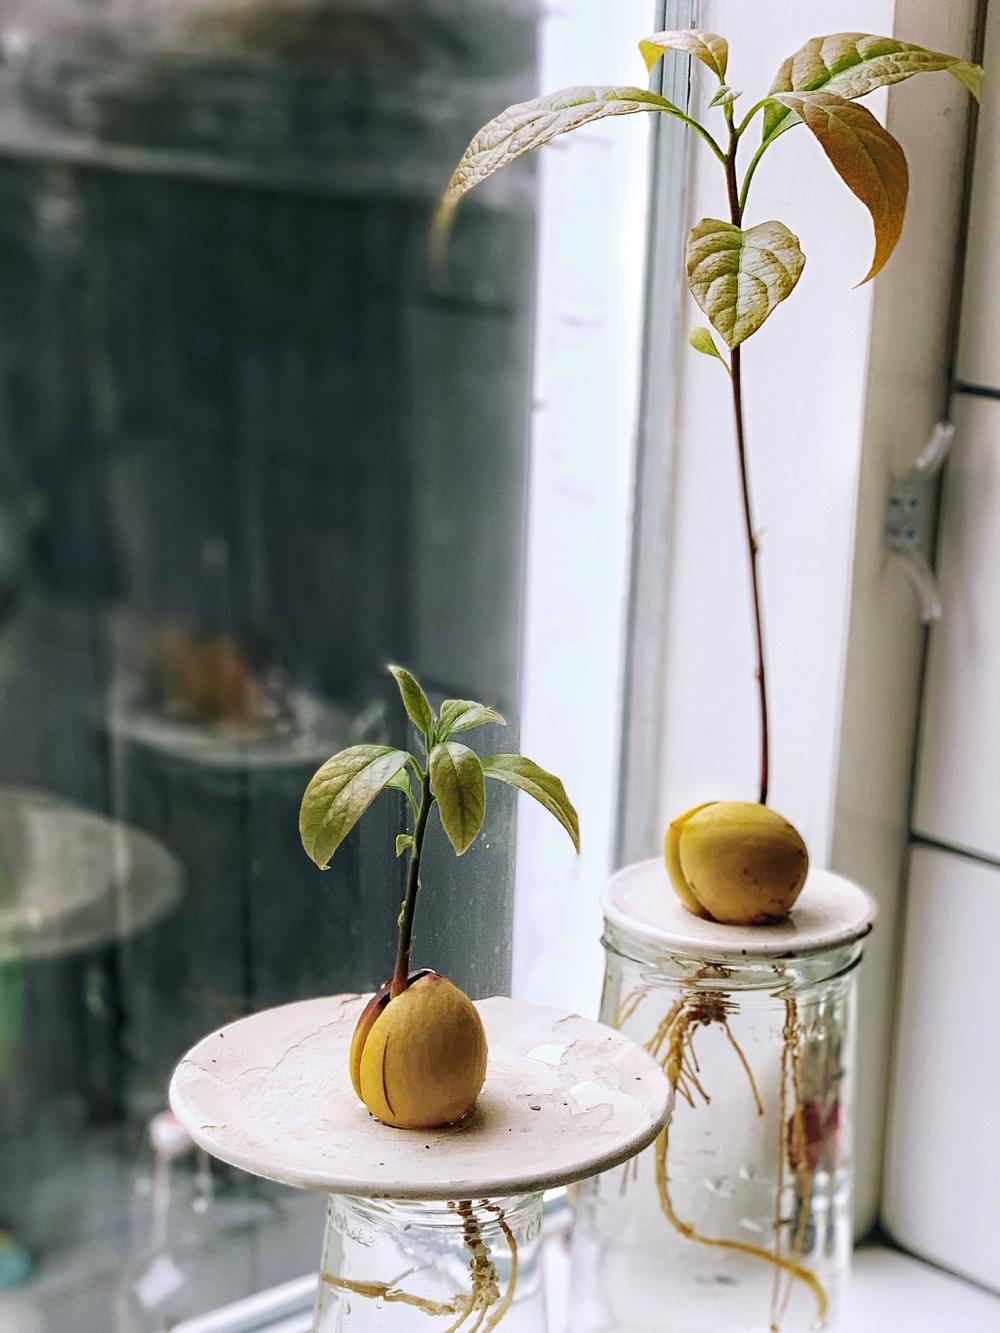 avocadoboom groeien